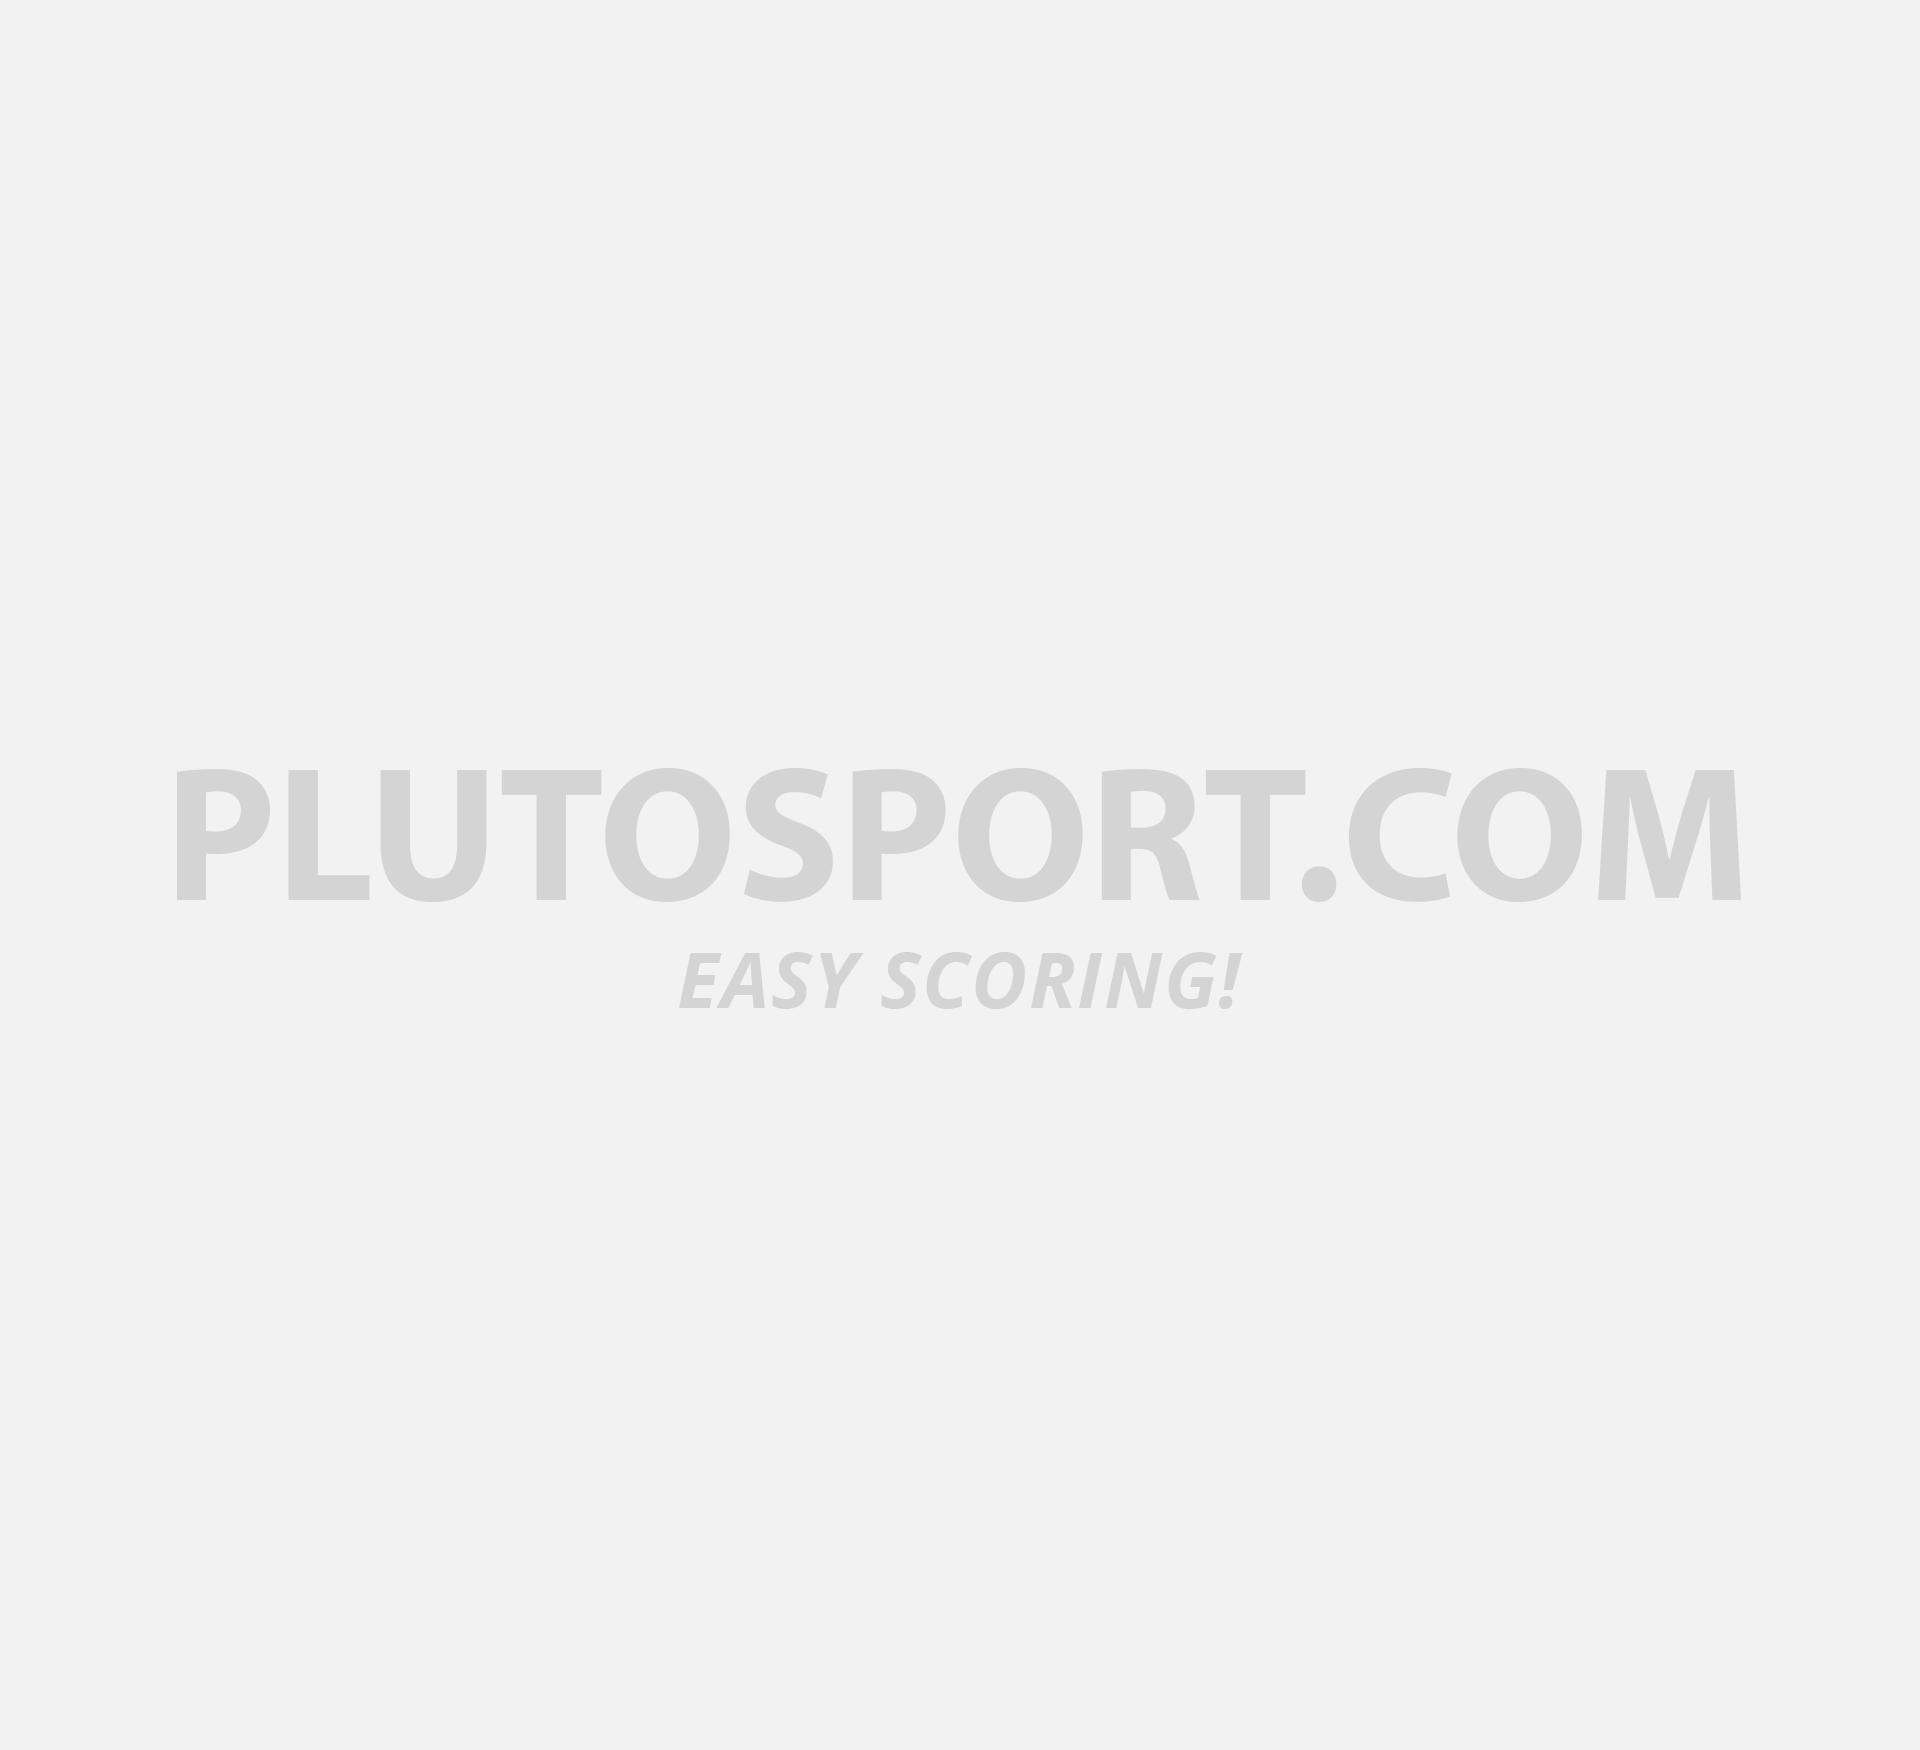 0ad914c7e1 Lacoste Sport Tracksuit - Tracksuits - Clothing - Lifestyle - Sports |  Plutosport